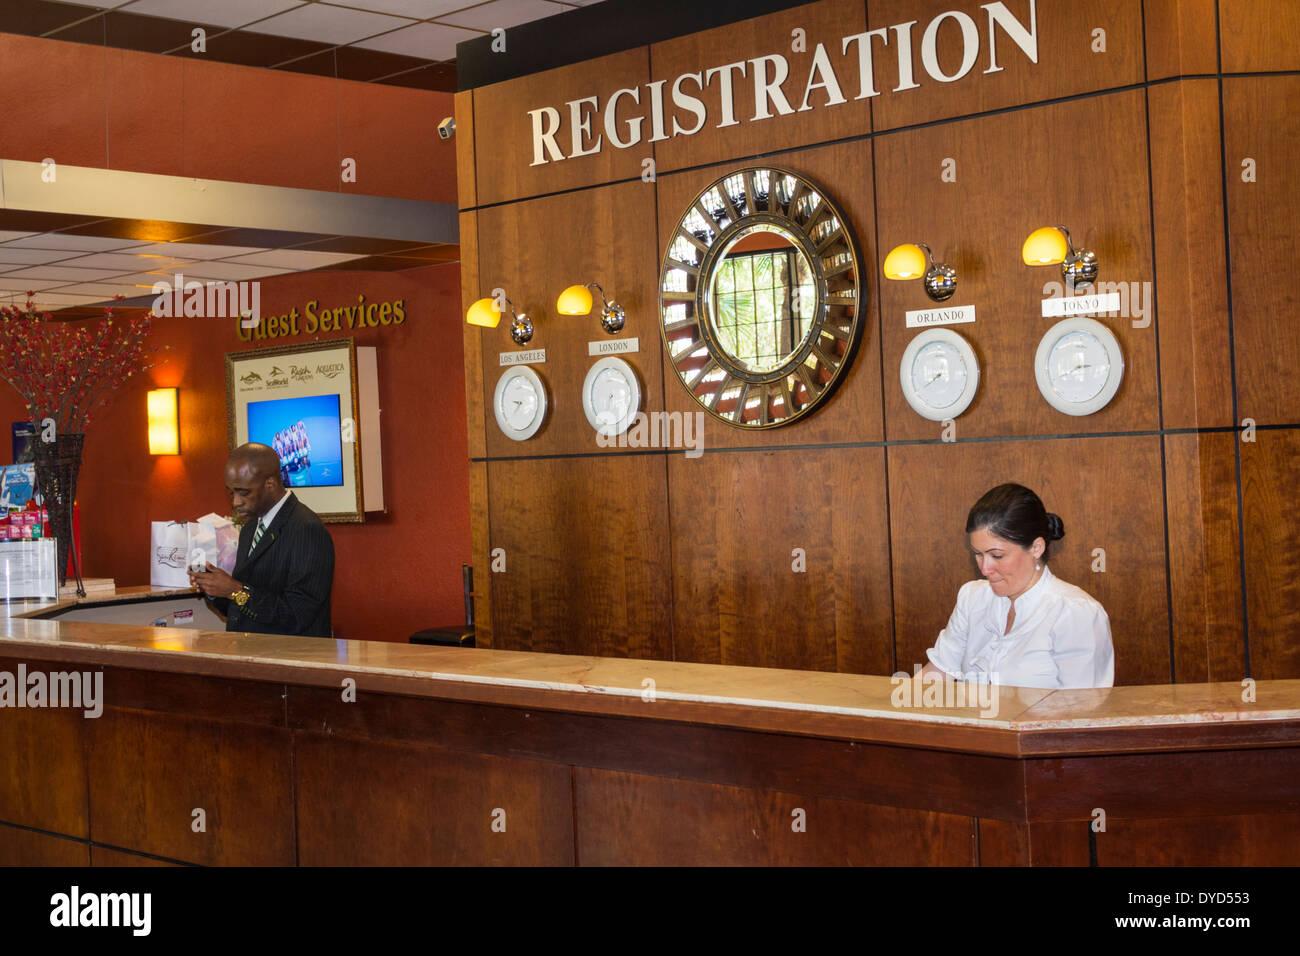 Orlando Florida Allure Resort International Drive Hotel Lobby Front Desk  Reception Registration Asian Woman Black